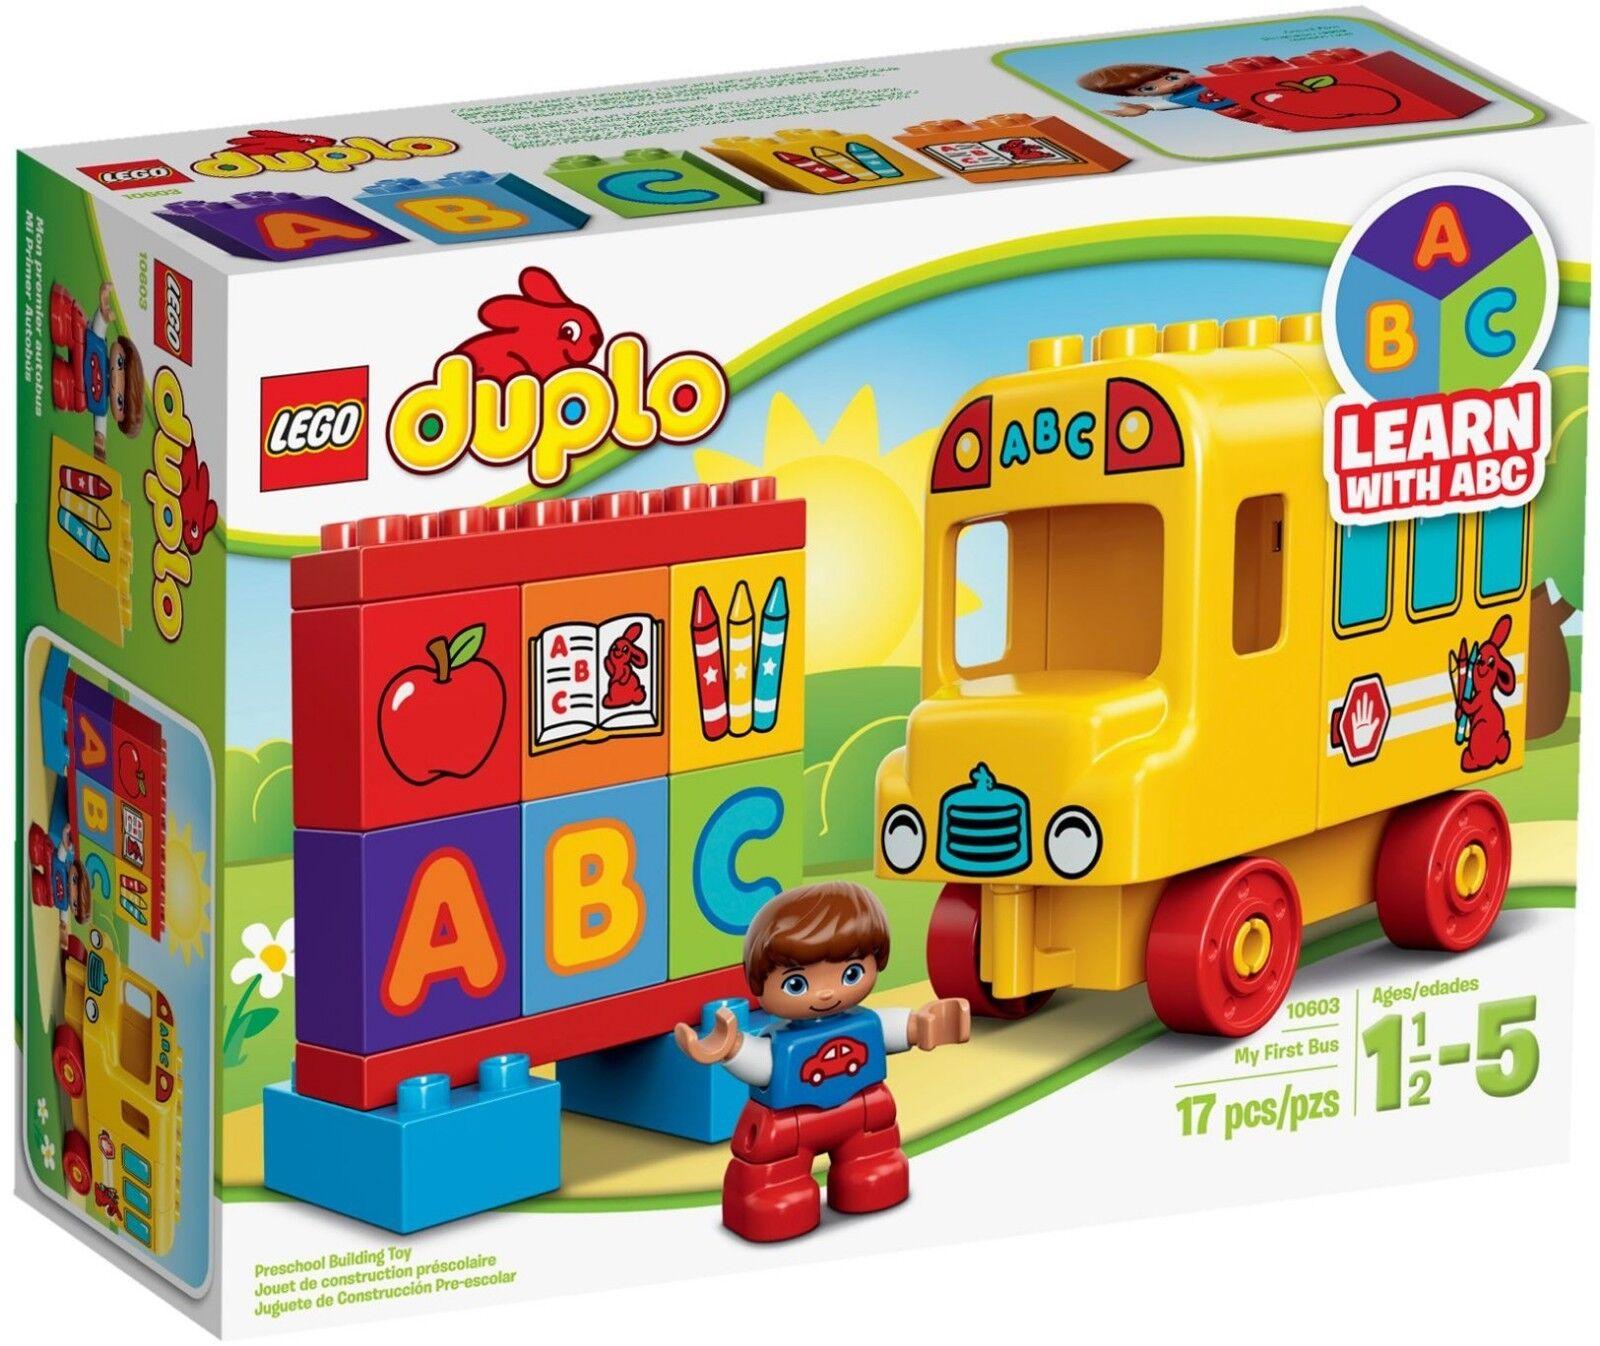 Lego 10603 Duplo My first Bus school bus ABC alphabet school supplies